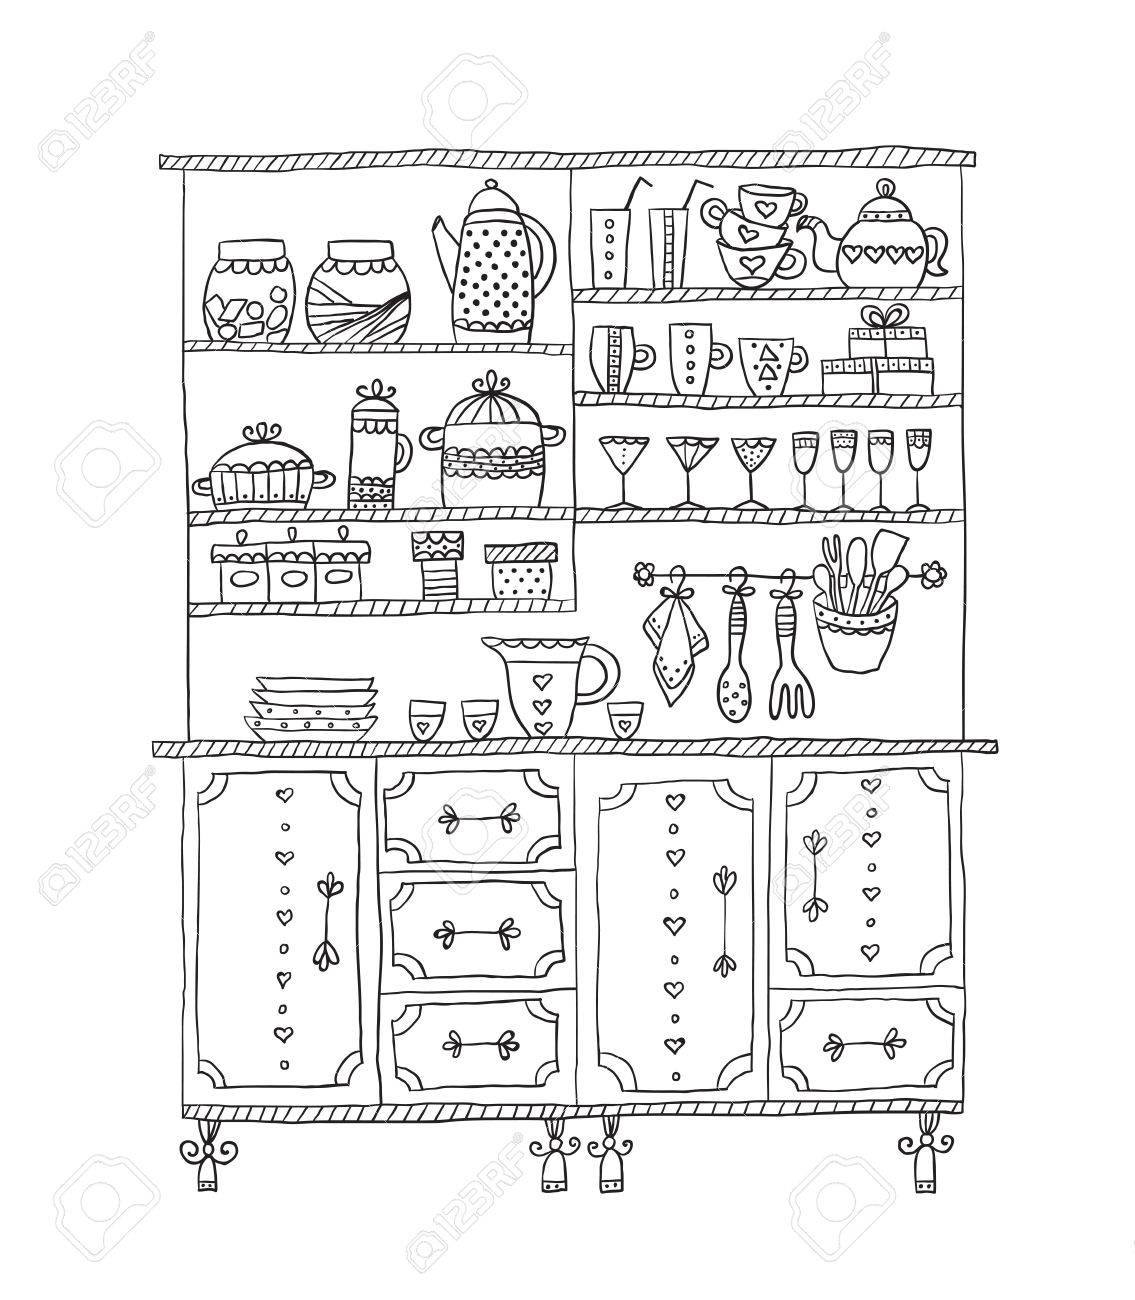 Kitchen Cabinet with various utensils. Design elements of kitchen.